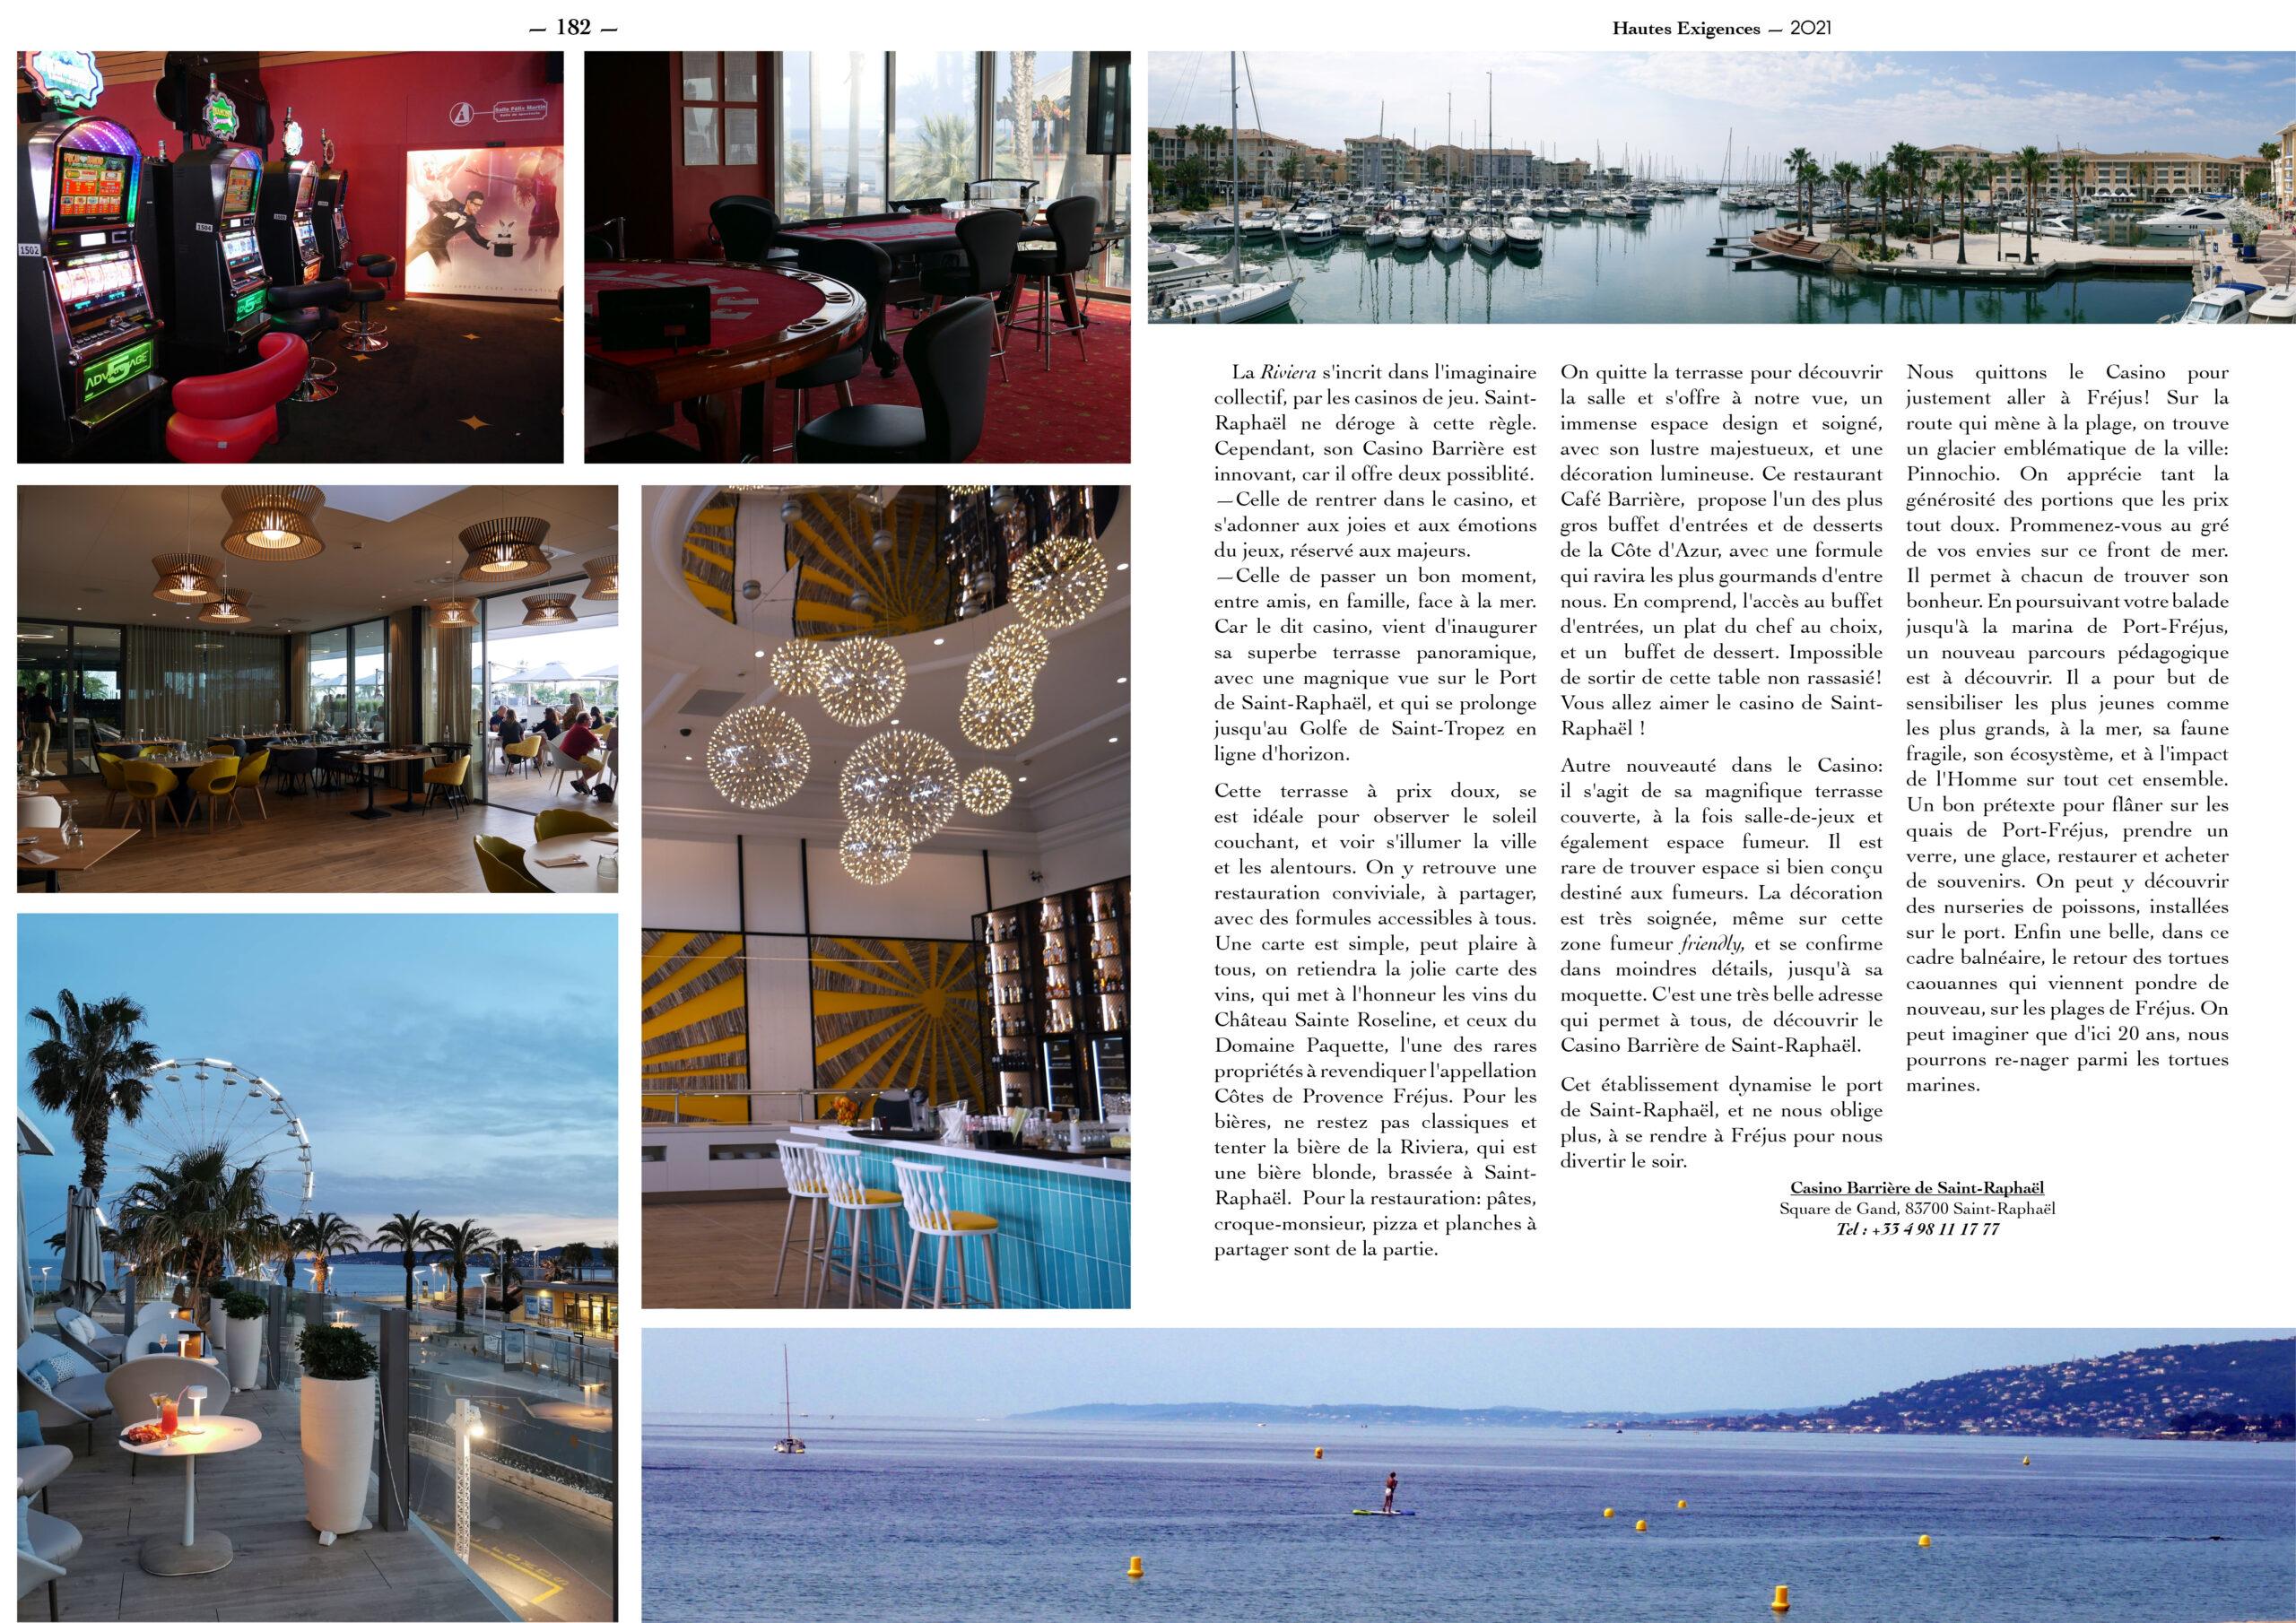 Hautes Exigences Magazine Hors Serie 2021 page 180-181